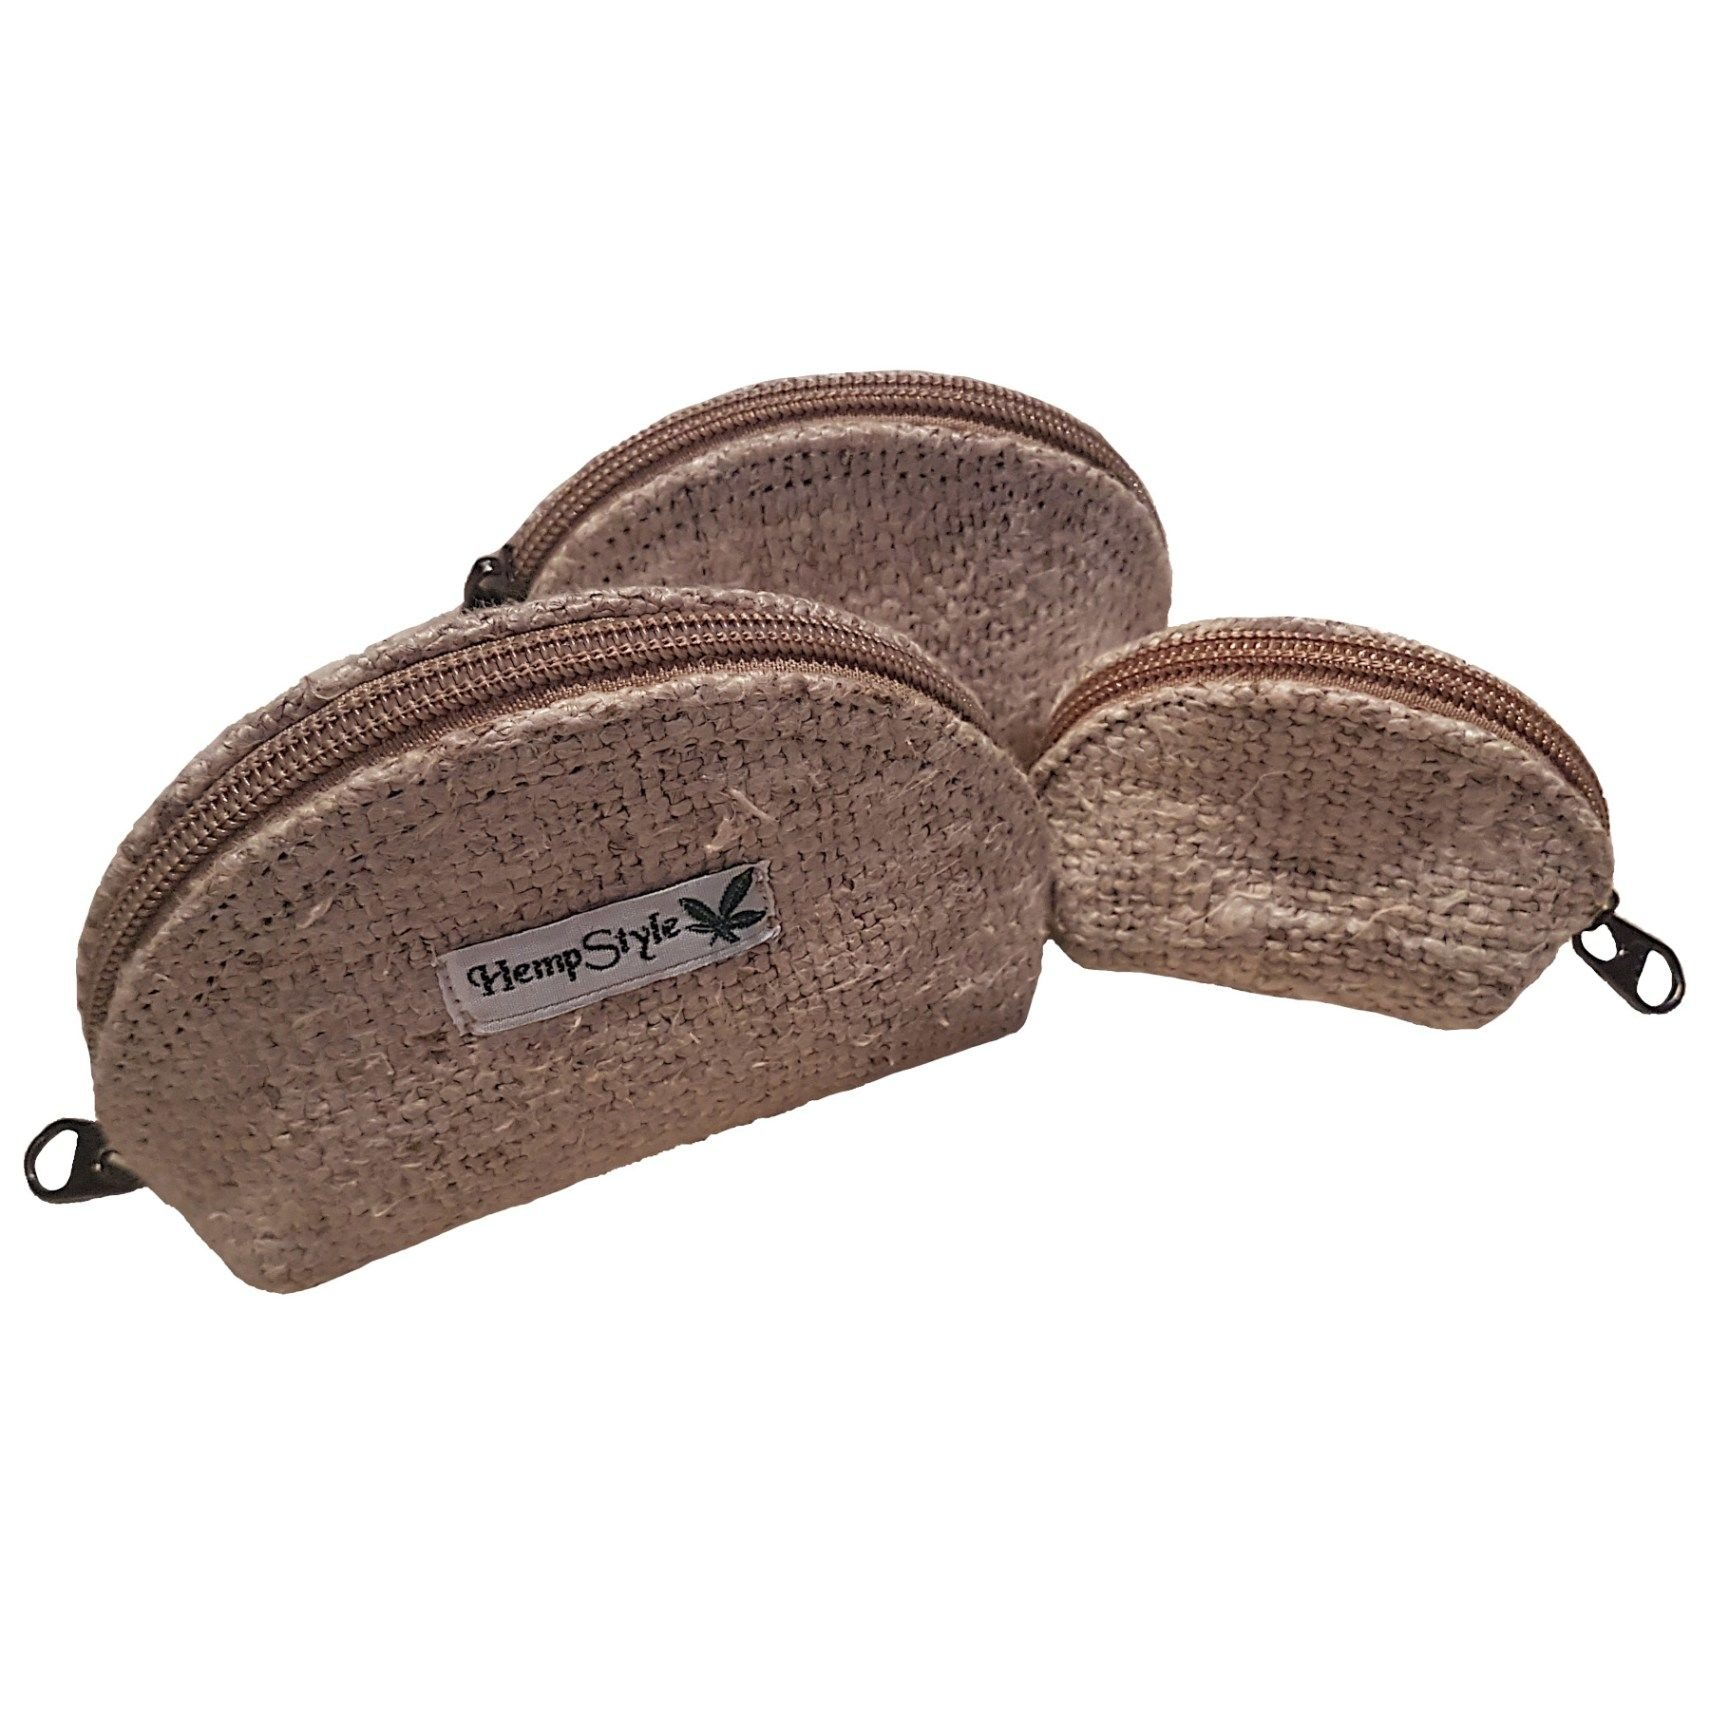 Coin hemp purse 3 piece